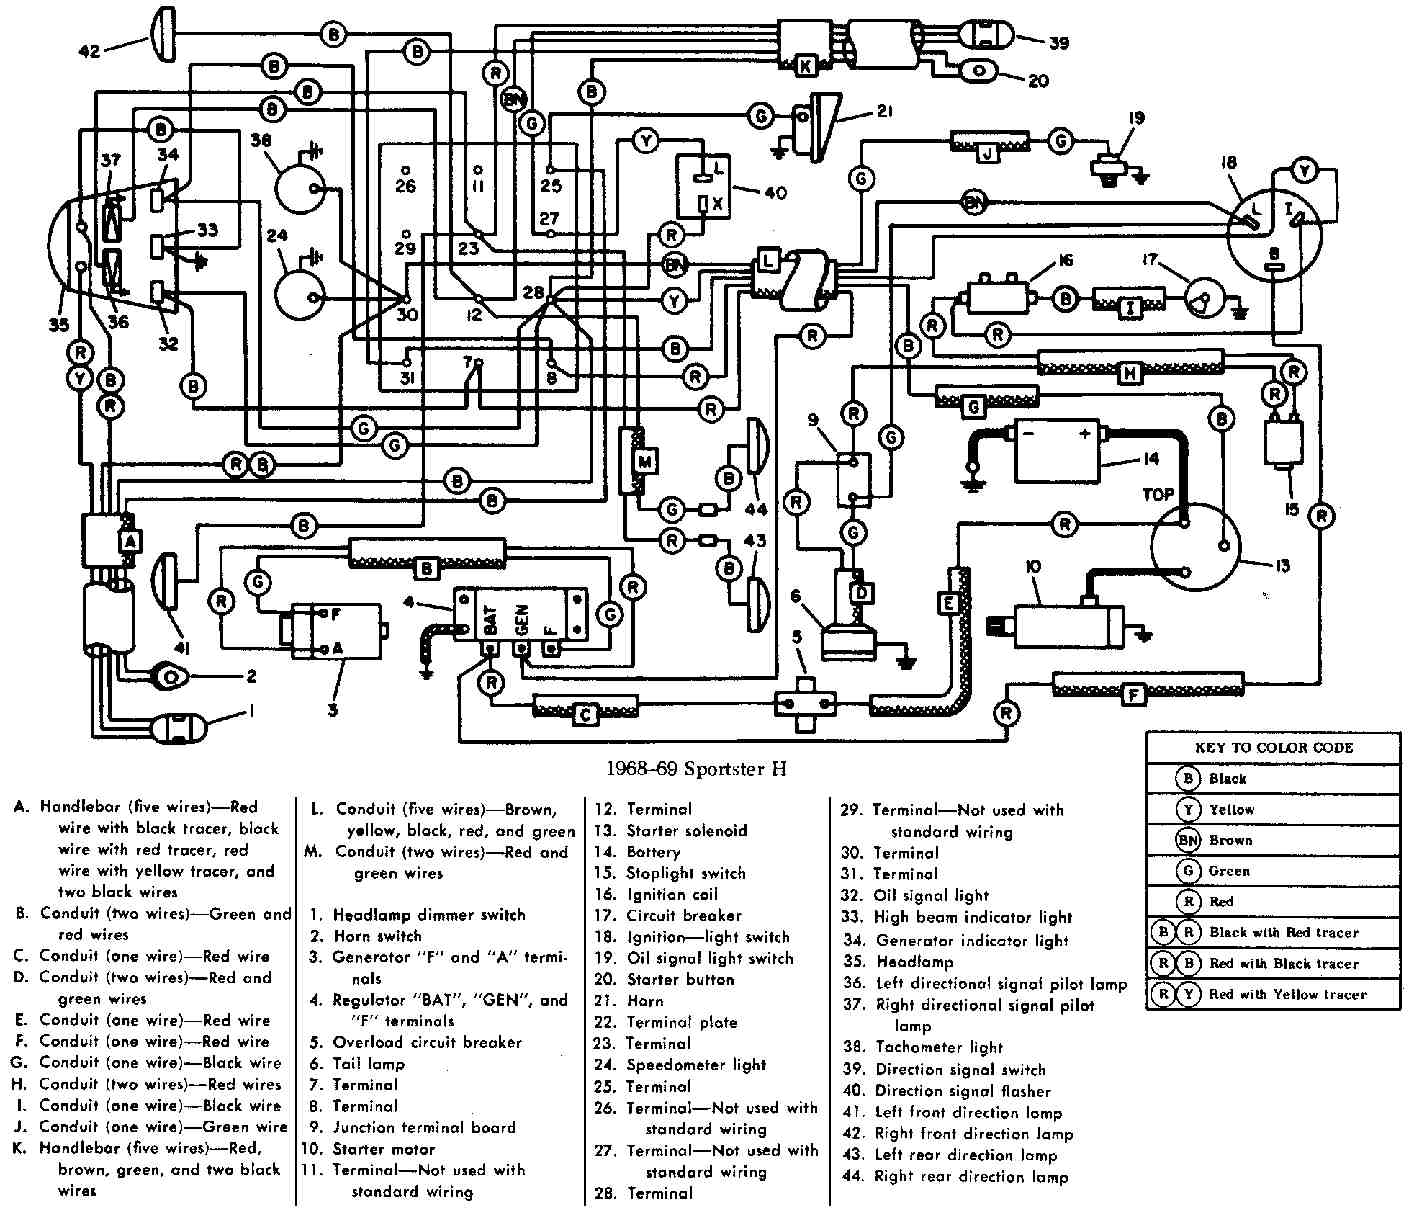 Harle Davidson Wiring Diagram – Name on delco voltage regulator wiring diagram, dodge voltage regulator wiring diagram, farmall cub voltage regulator wiring diagram, ford voltage regulator wiring diagram, gm voltage regulator wiring diagram, mopar voltage regulator wiring diagram, kubota voltage regulator wiring diagram, vw voltage regulator wiring diagram, generator voltage regulator wiring diagram, kohler voltage regulator wiring diagram, prestolite voltage regulator wiring diagram,